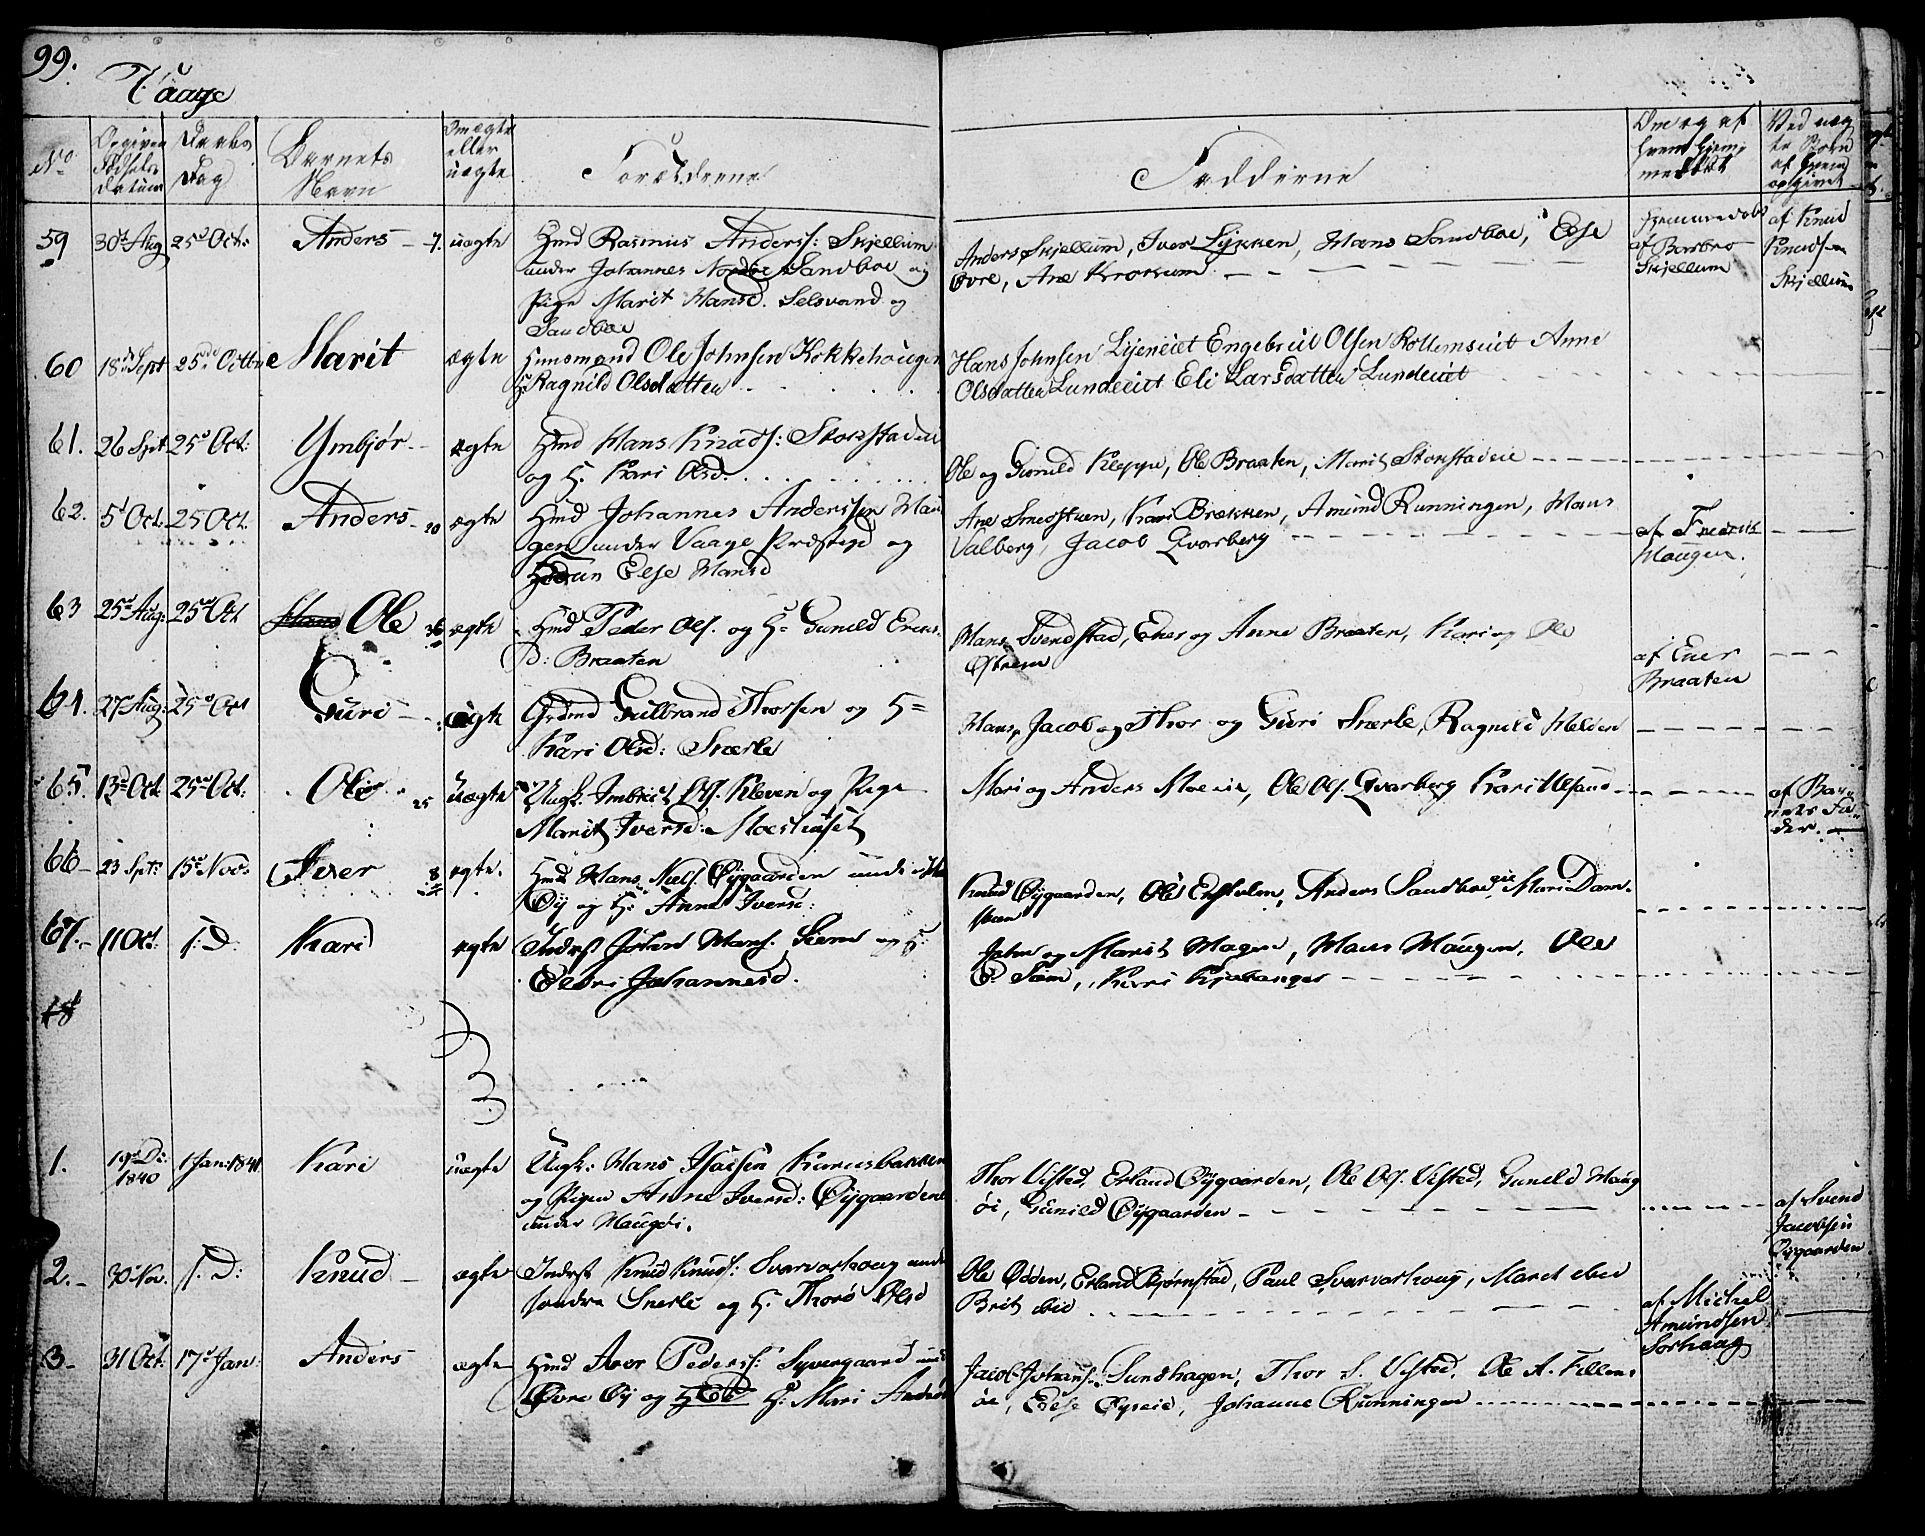 SAH, Vågå prestekontor, Ministerialbok nr. 4 /1, 1827-1842, s. 99